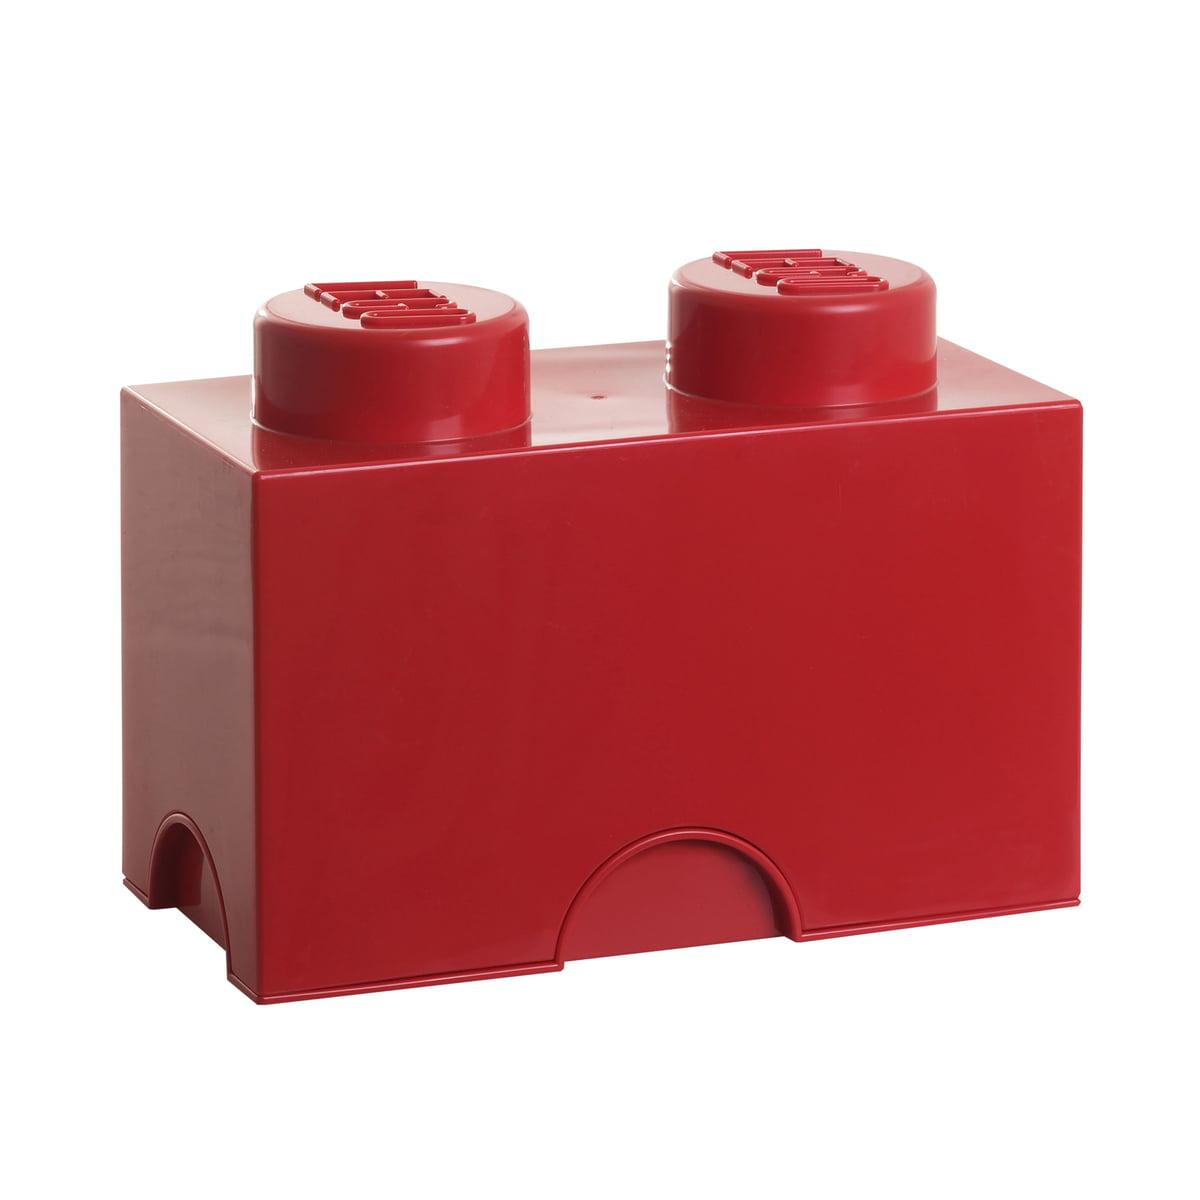 Lego - Storage Brick 2, rot | Kinderzimmer > Spielzeuge > Sonstige Spielzeuge | Rot | Polypropylen (pp) | Lego